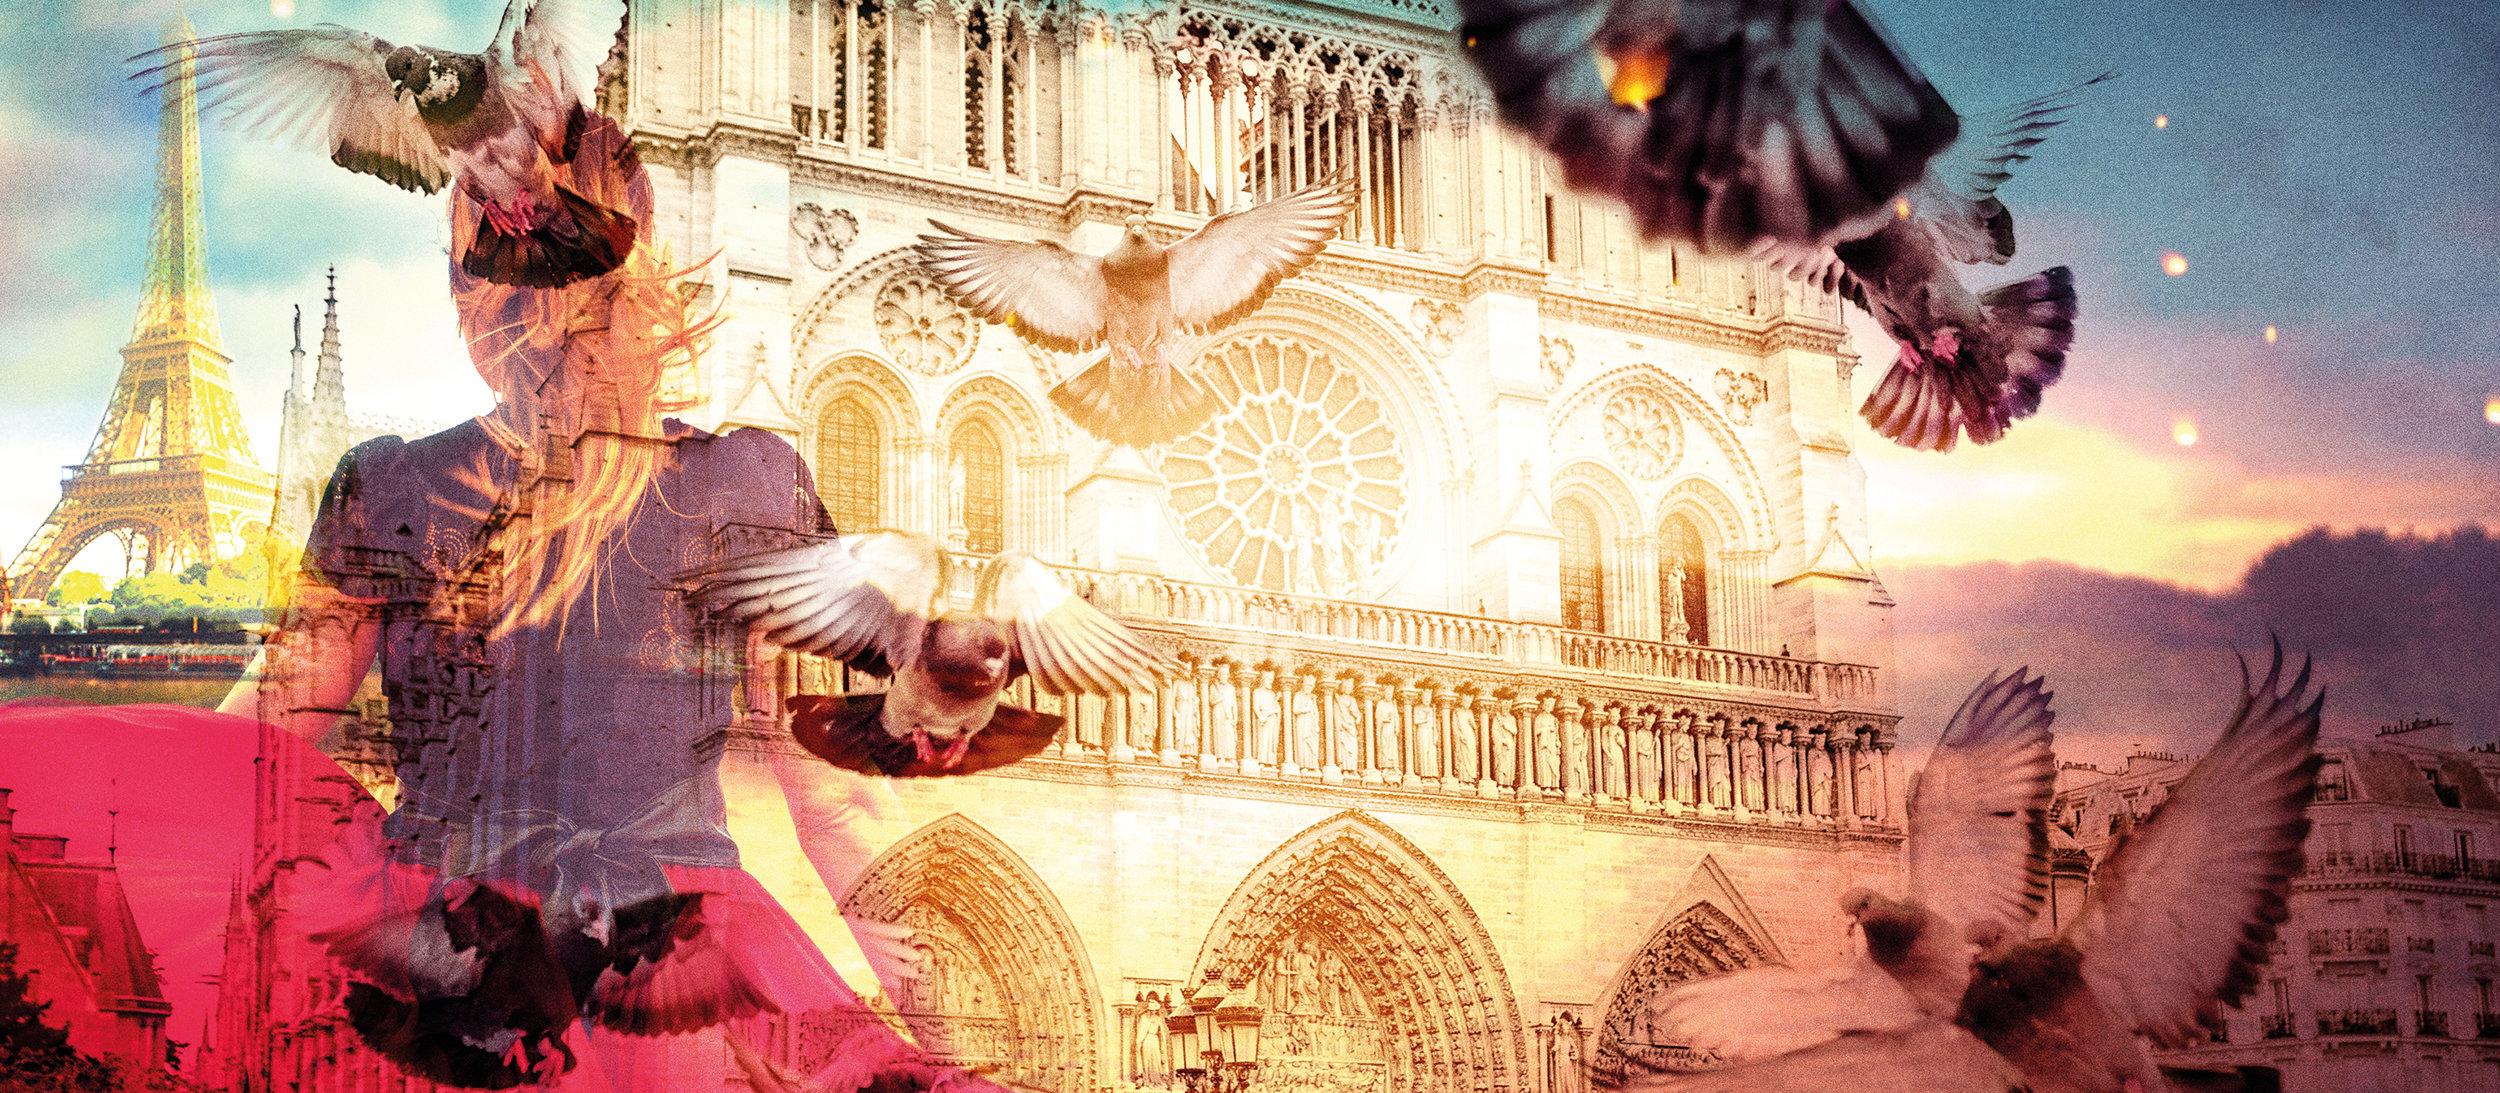 PARIS_MONTAGE_HIGH_RES_CROPPED.jpg